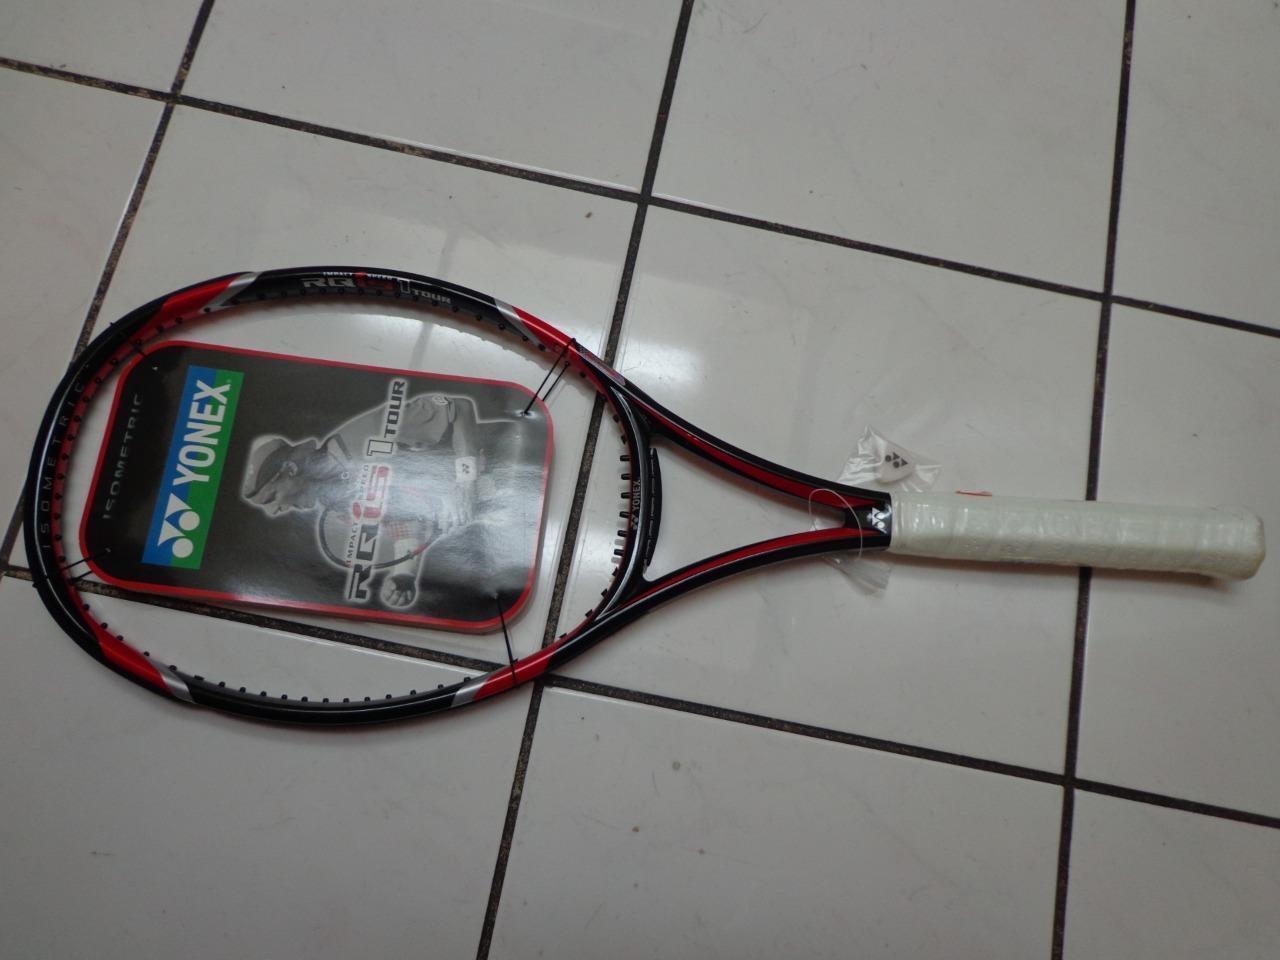 Nuevo Yonex Rq es 1 Tour 95 Head 16x18 4 1 8 Grip 295 Gr tenis raqueta